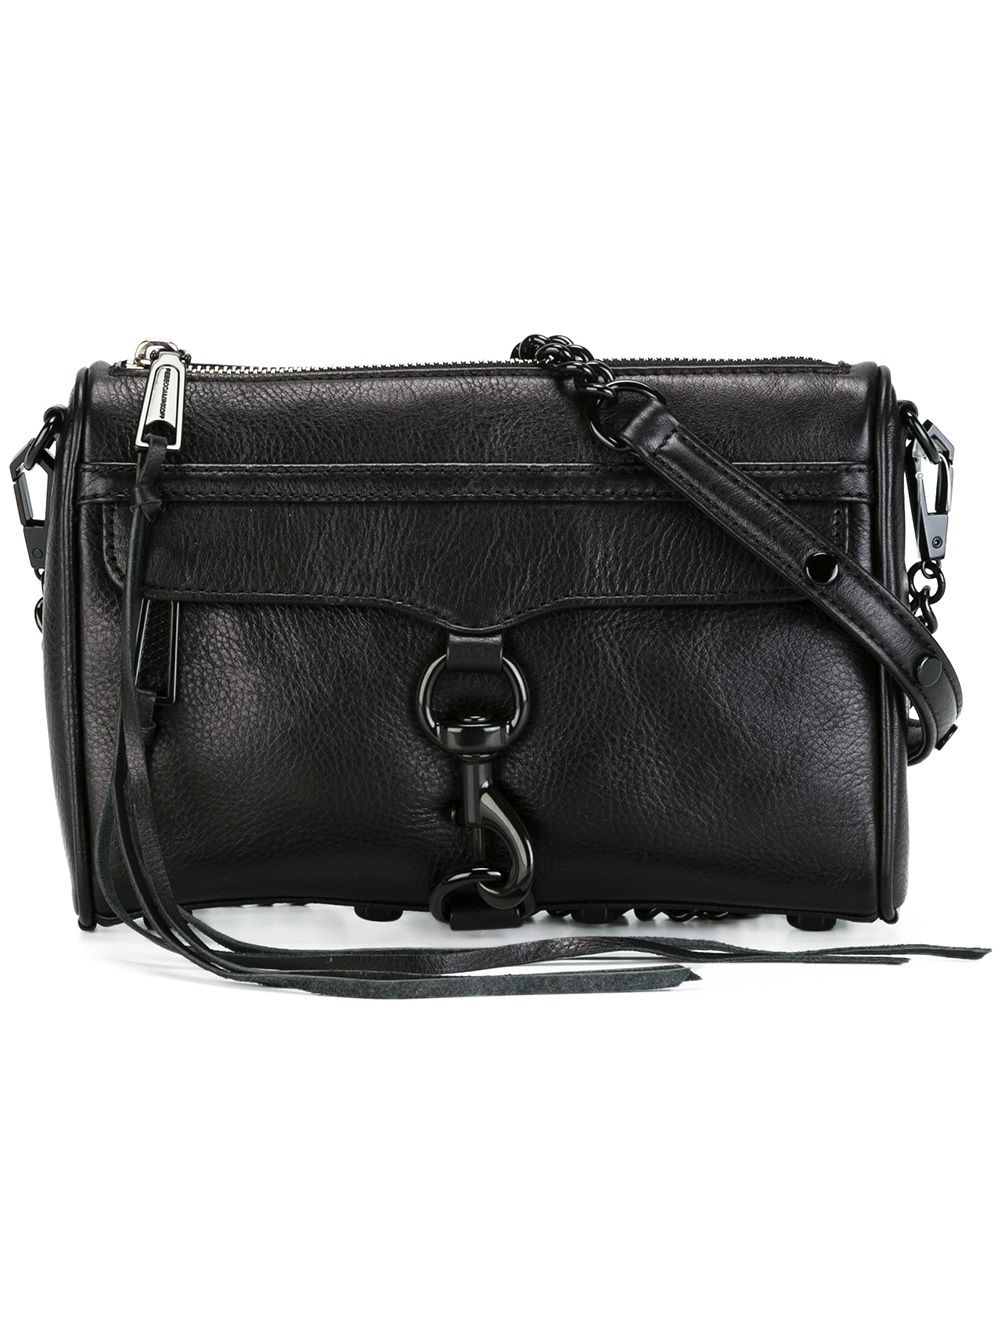 Mac Leather Mini Bag